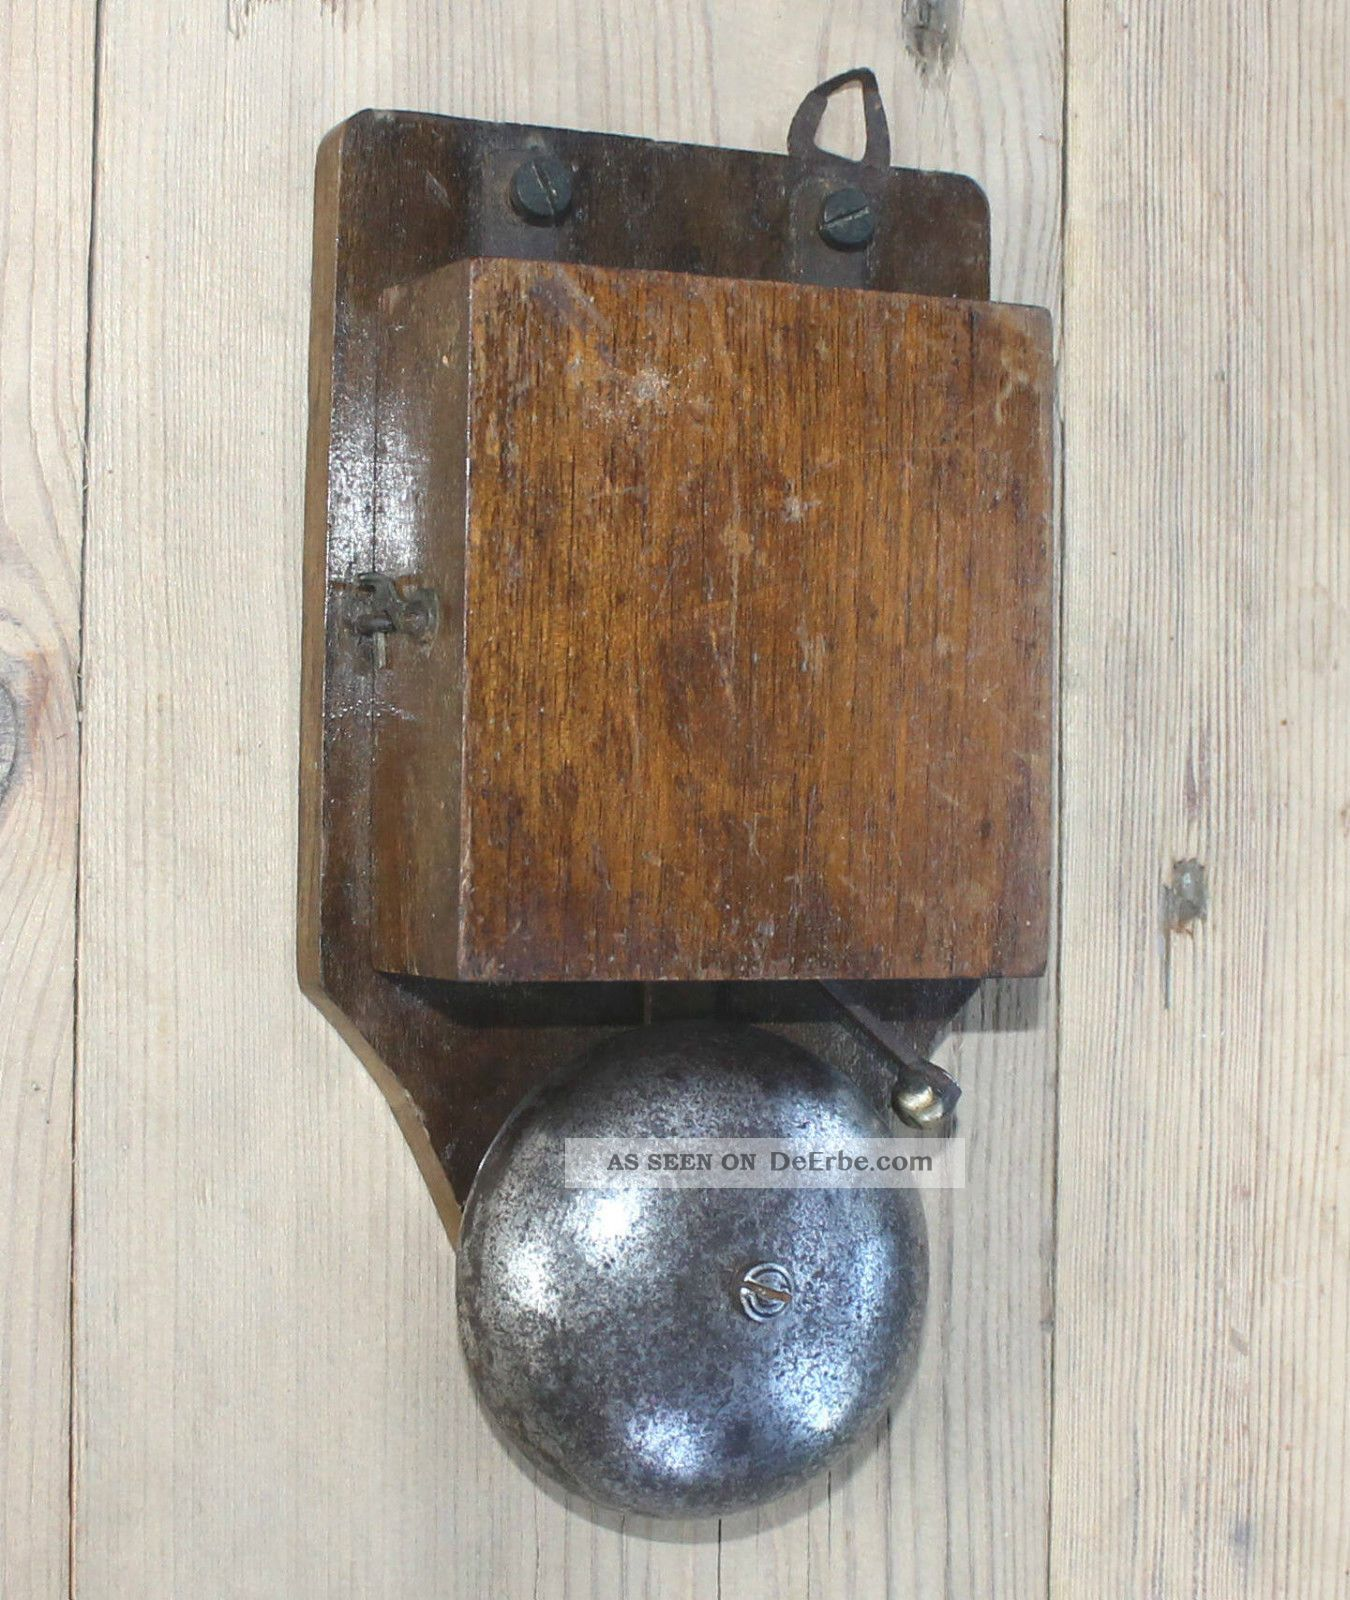 Alte Antike Türklingel Hotelklingel Glocke Industriedesign Loft Vintage Retro Nostalgie- & Neuware Bild